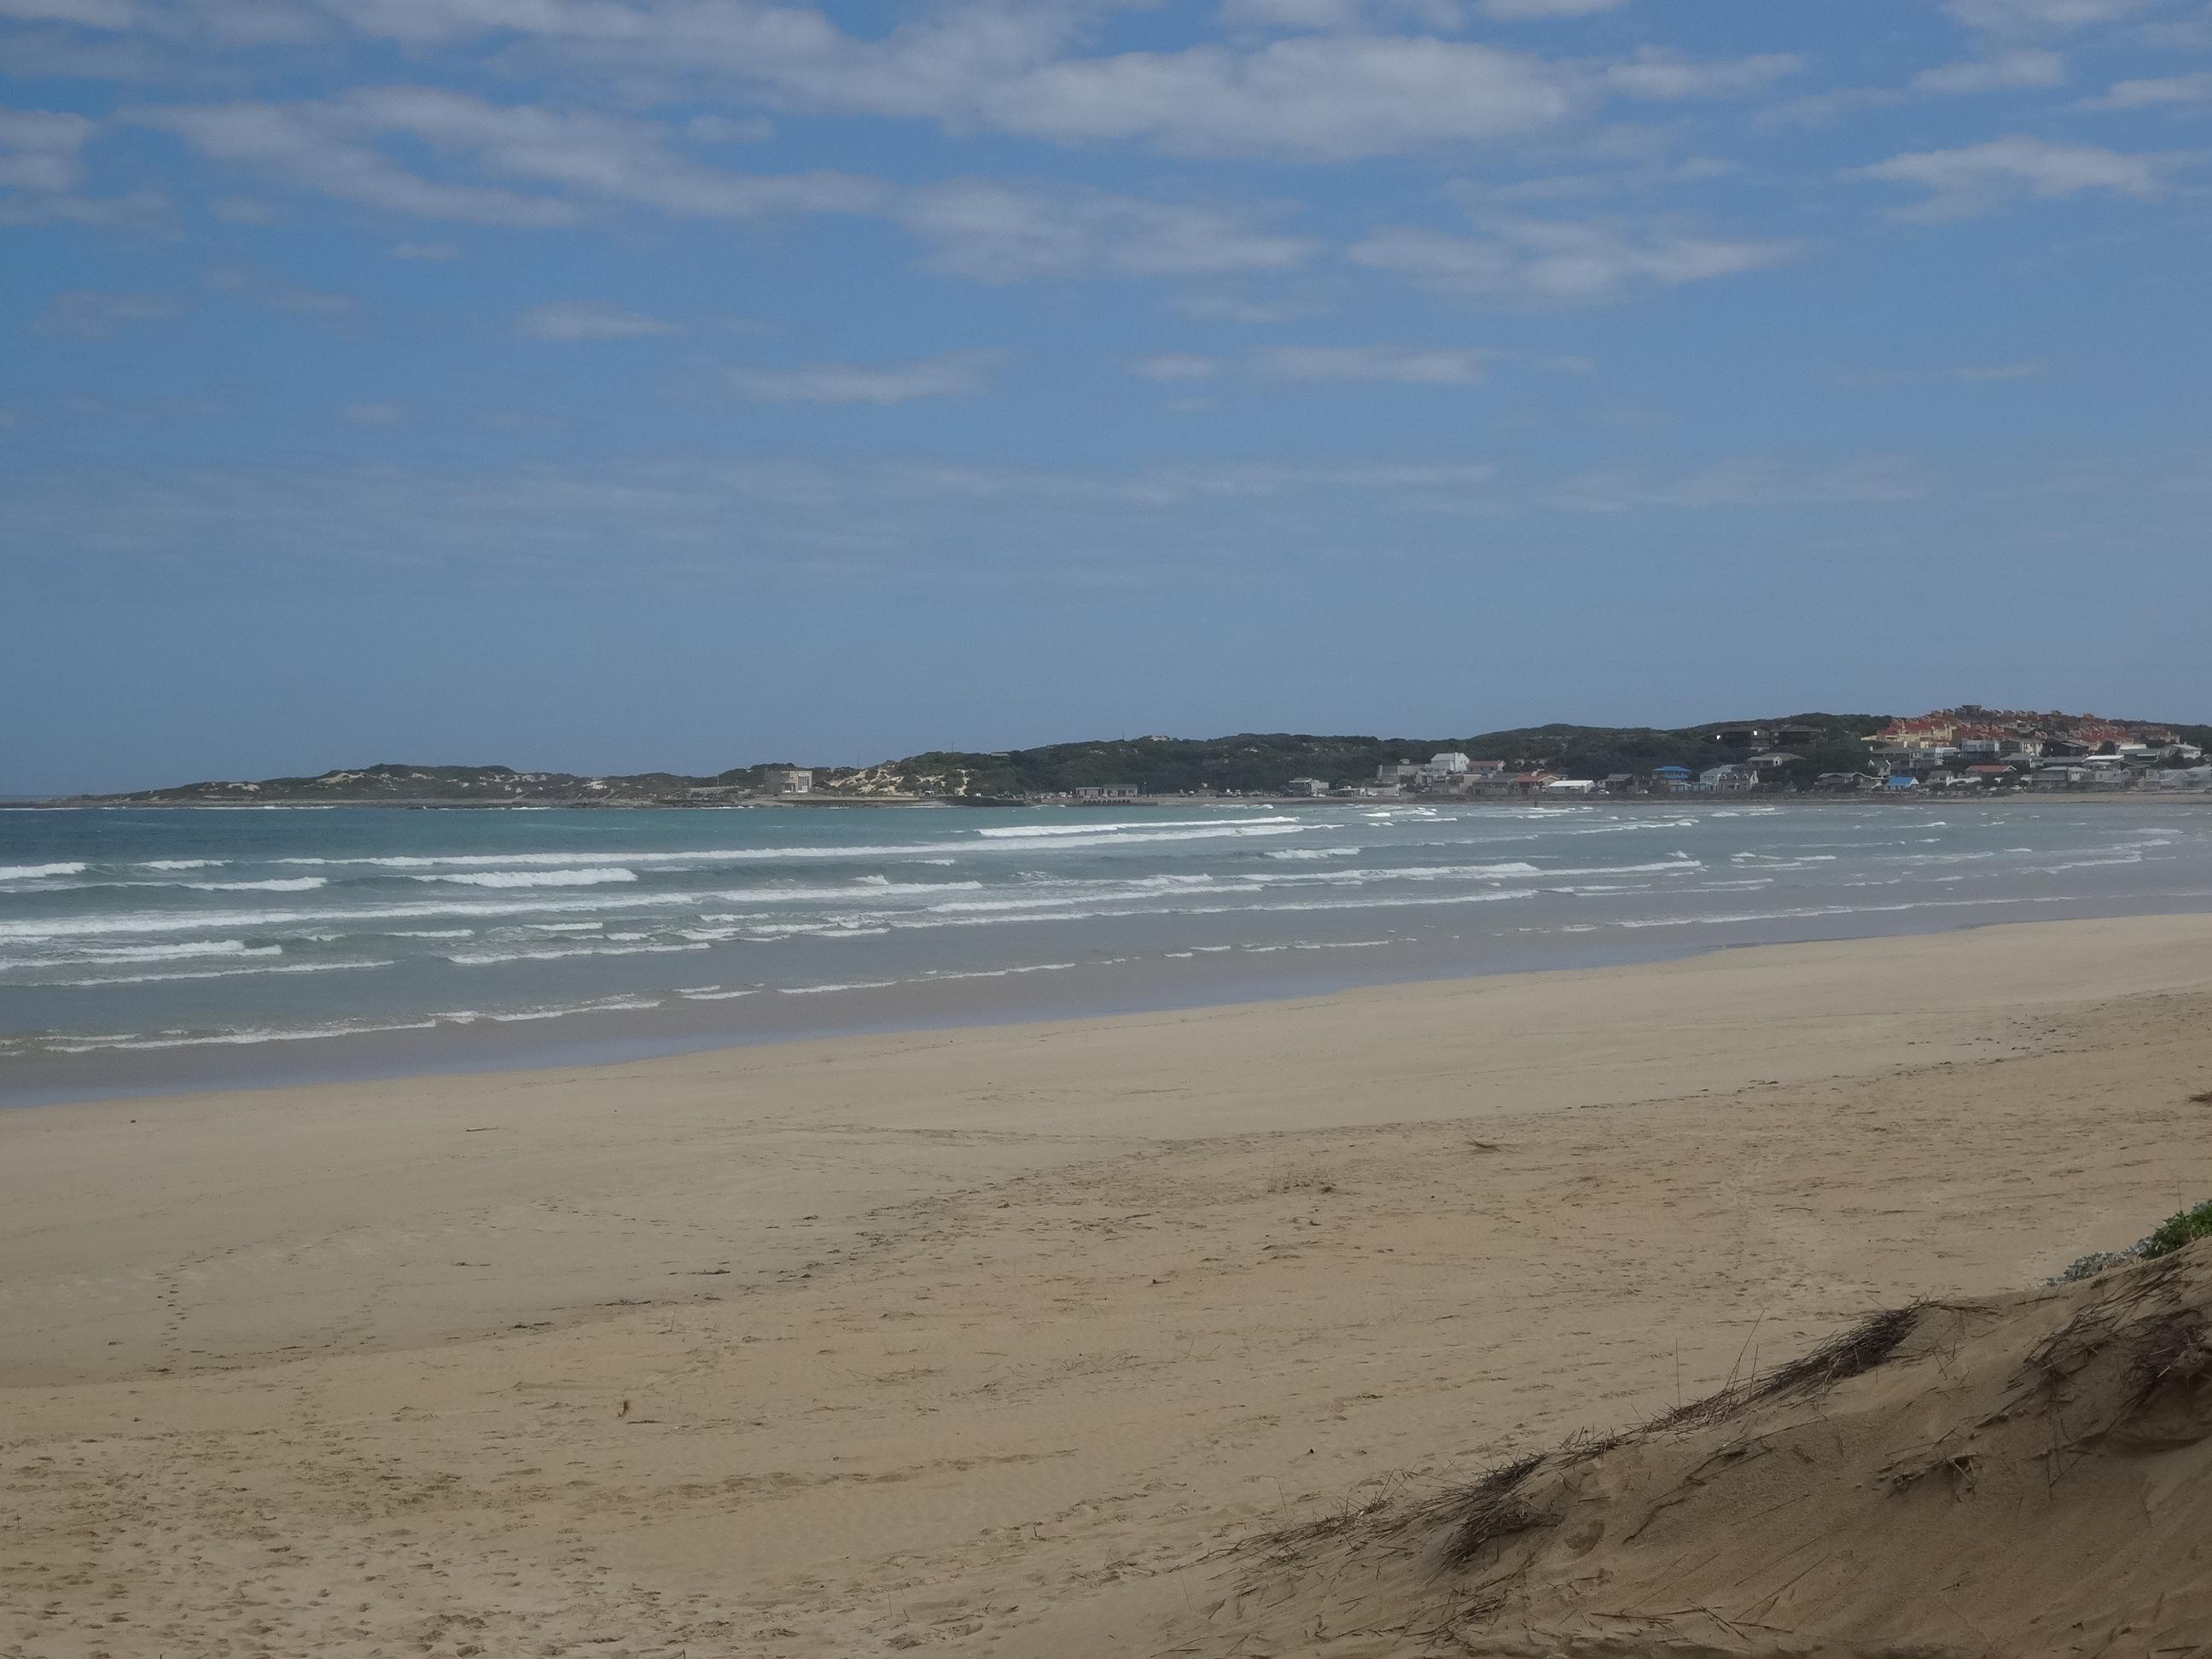 strand van Stilbaai